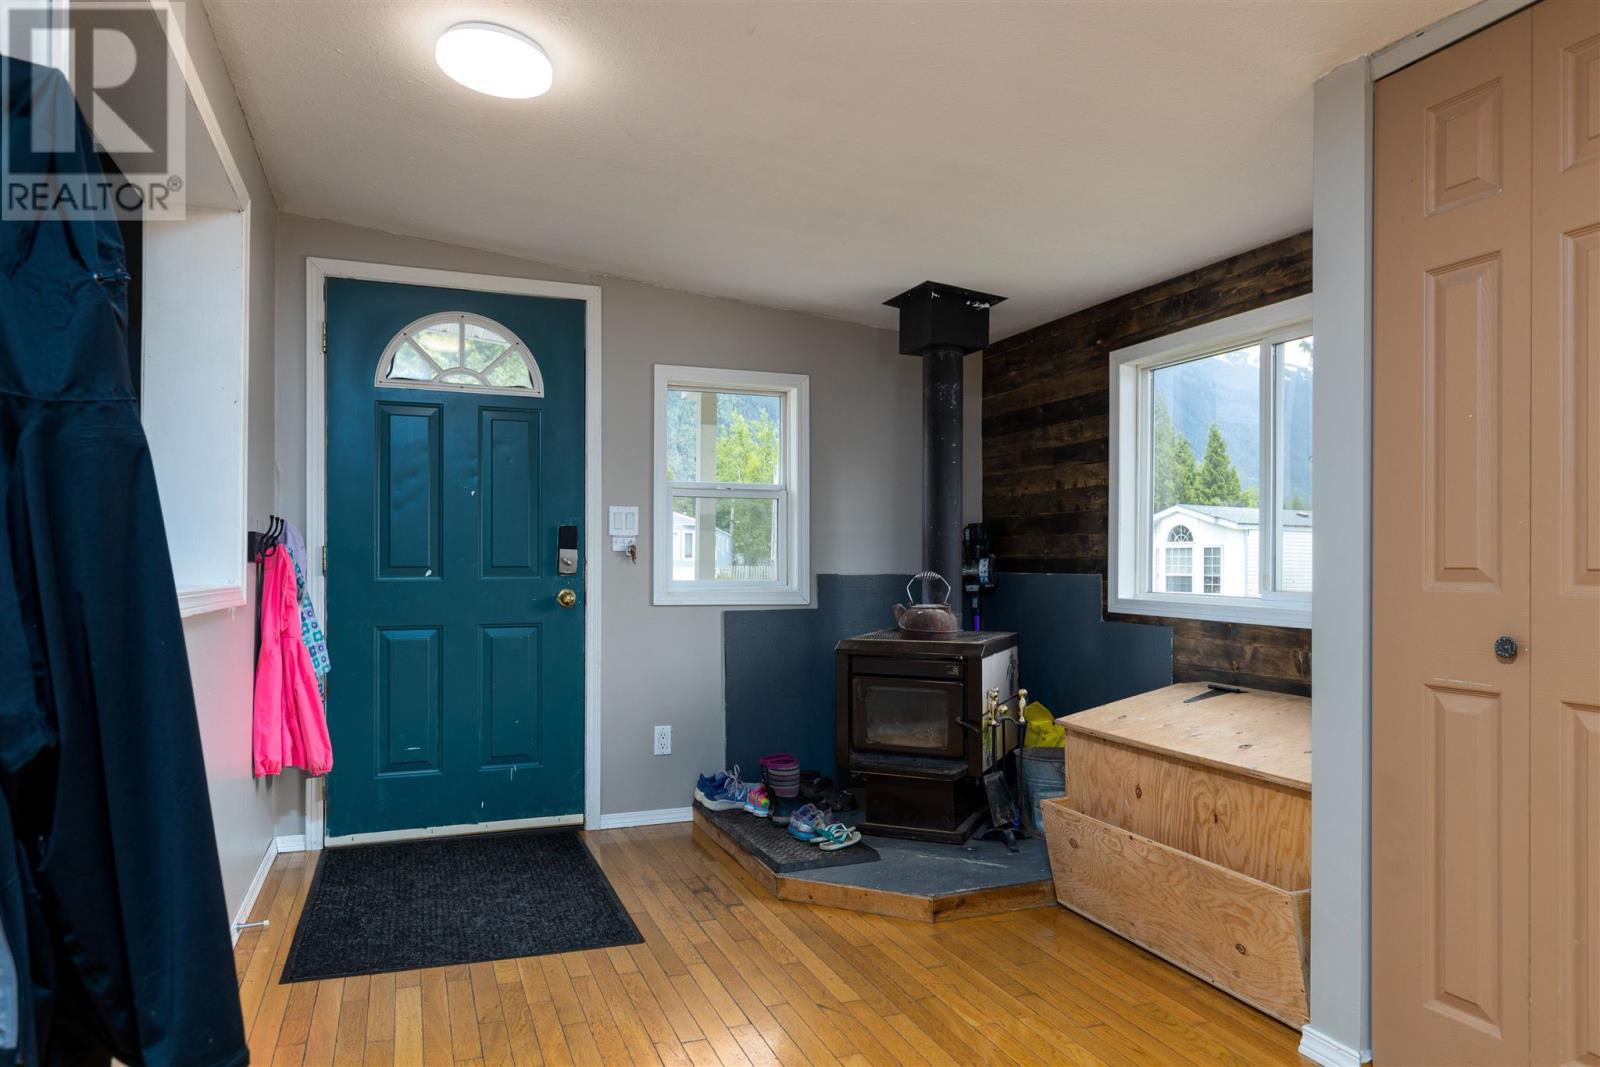 52 3616 Larch Avenue, Terrace, British Columbia  V8G 5B9 - Photo 2 - R2594554